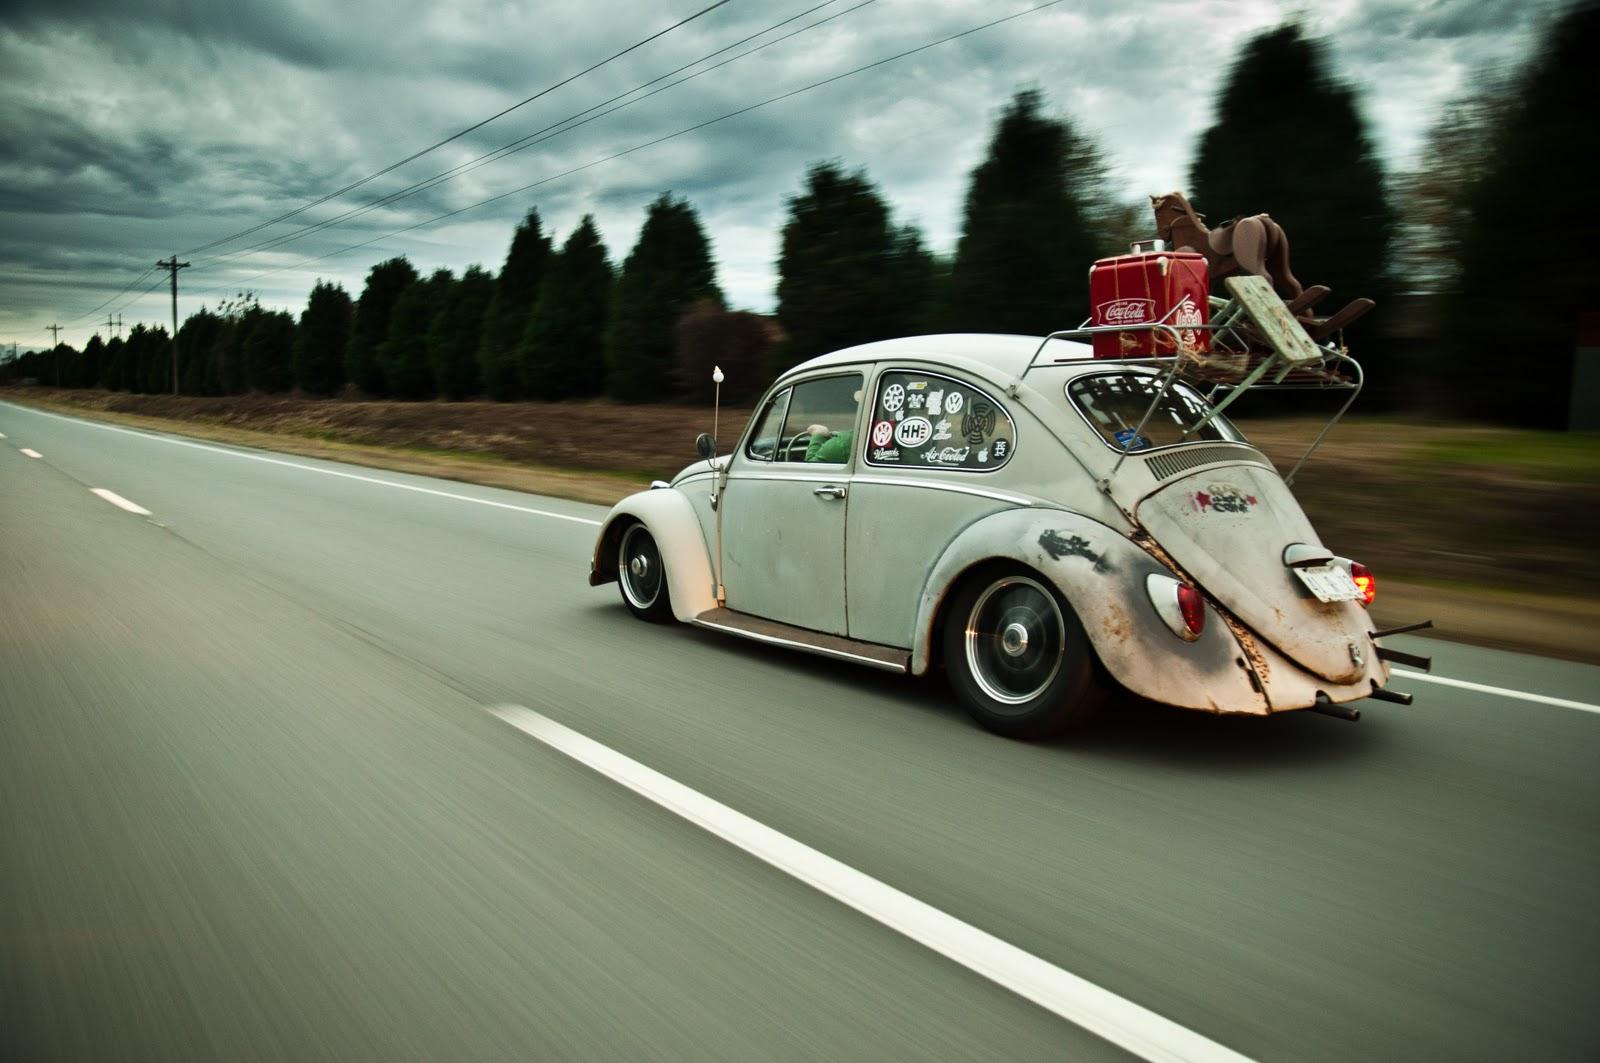 Otis - my '65 Beetle DSC_0040